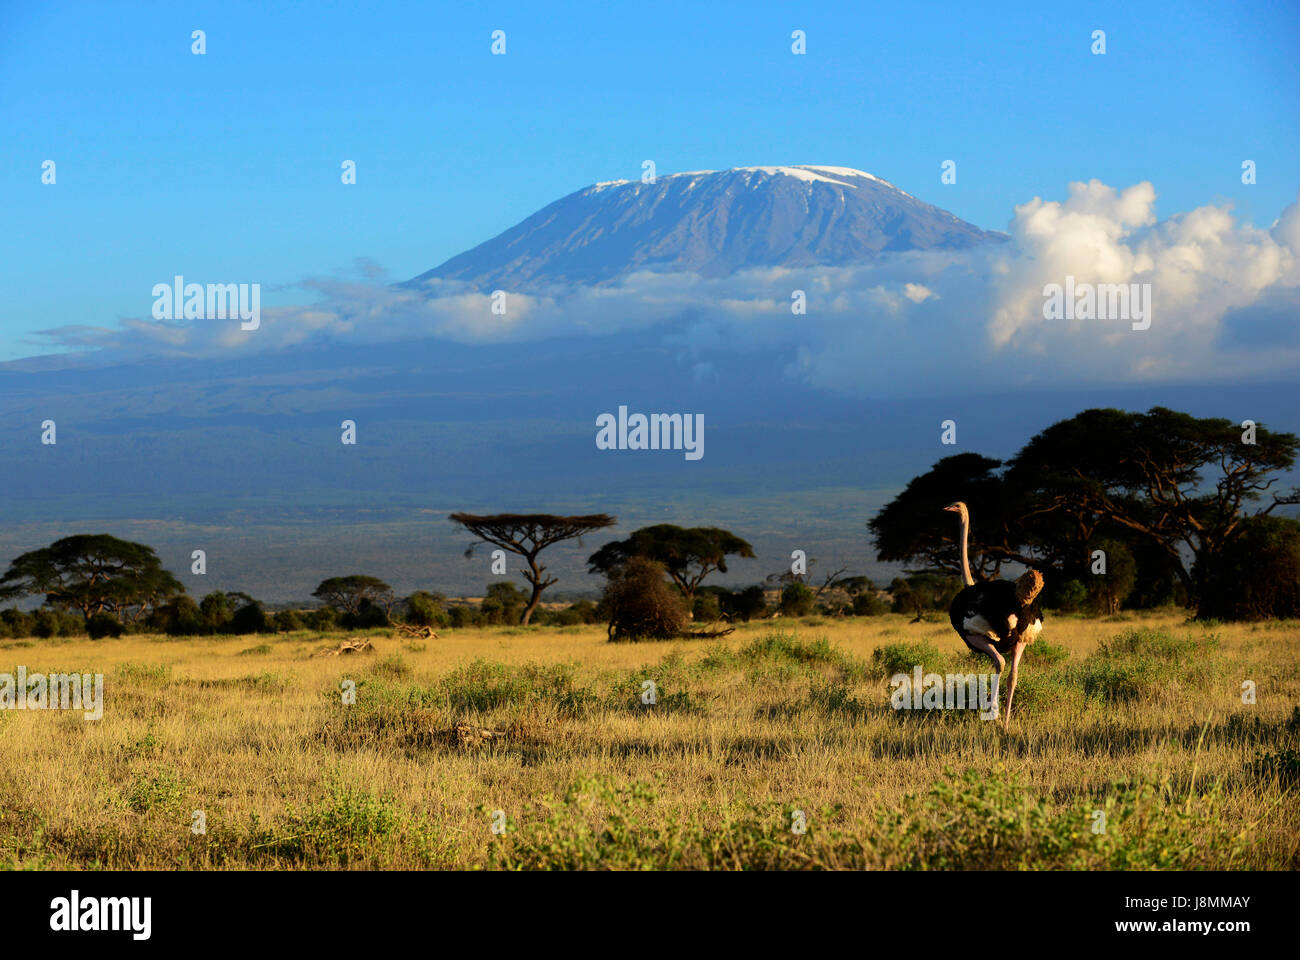 An Ostrich in Amboseli national park in Kenya. Mount Kilimanjaro towering behind. - Stock Image